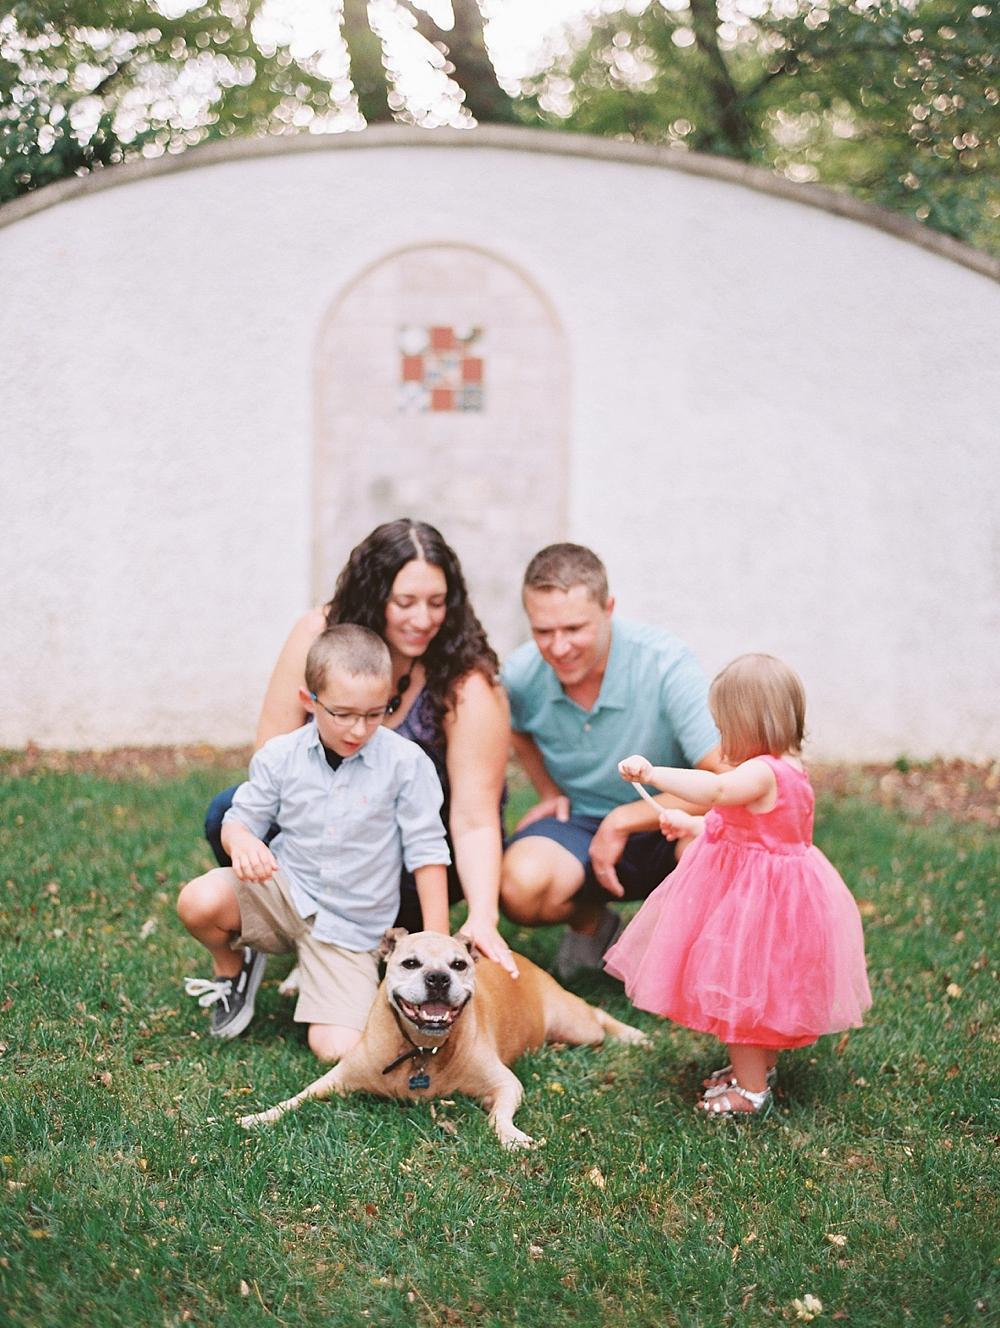 kristin-la-voie-photography-lifestyle-chicago-dog-72